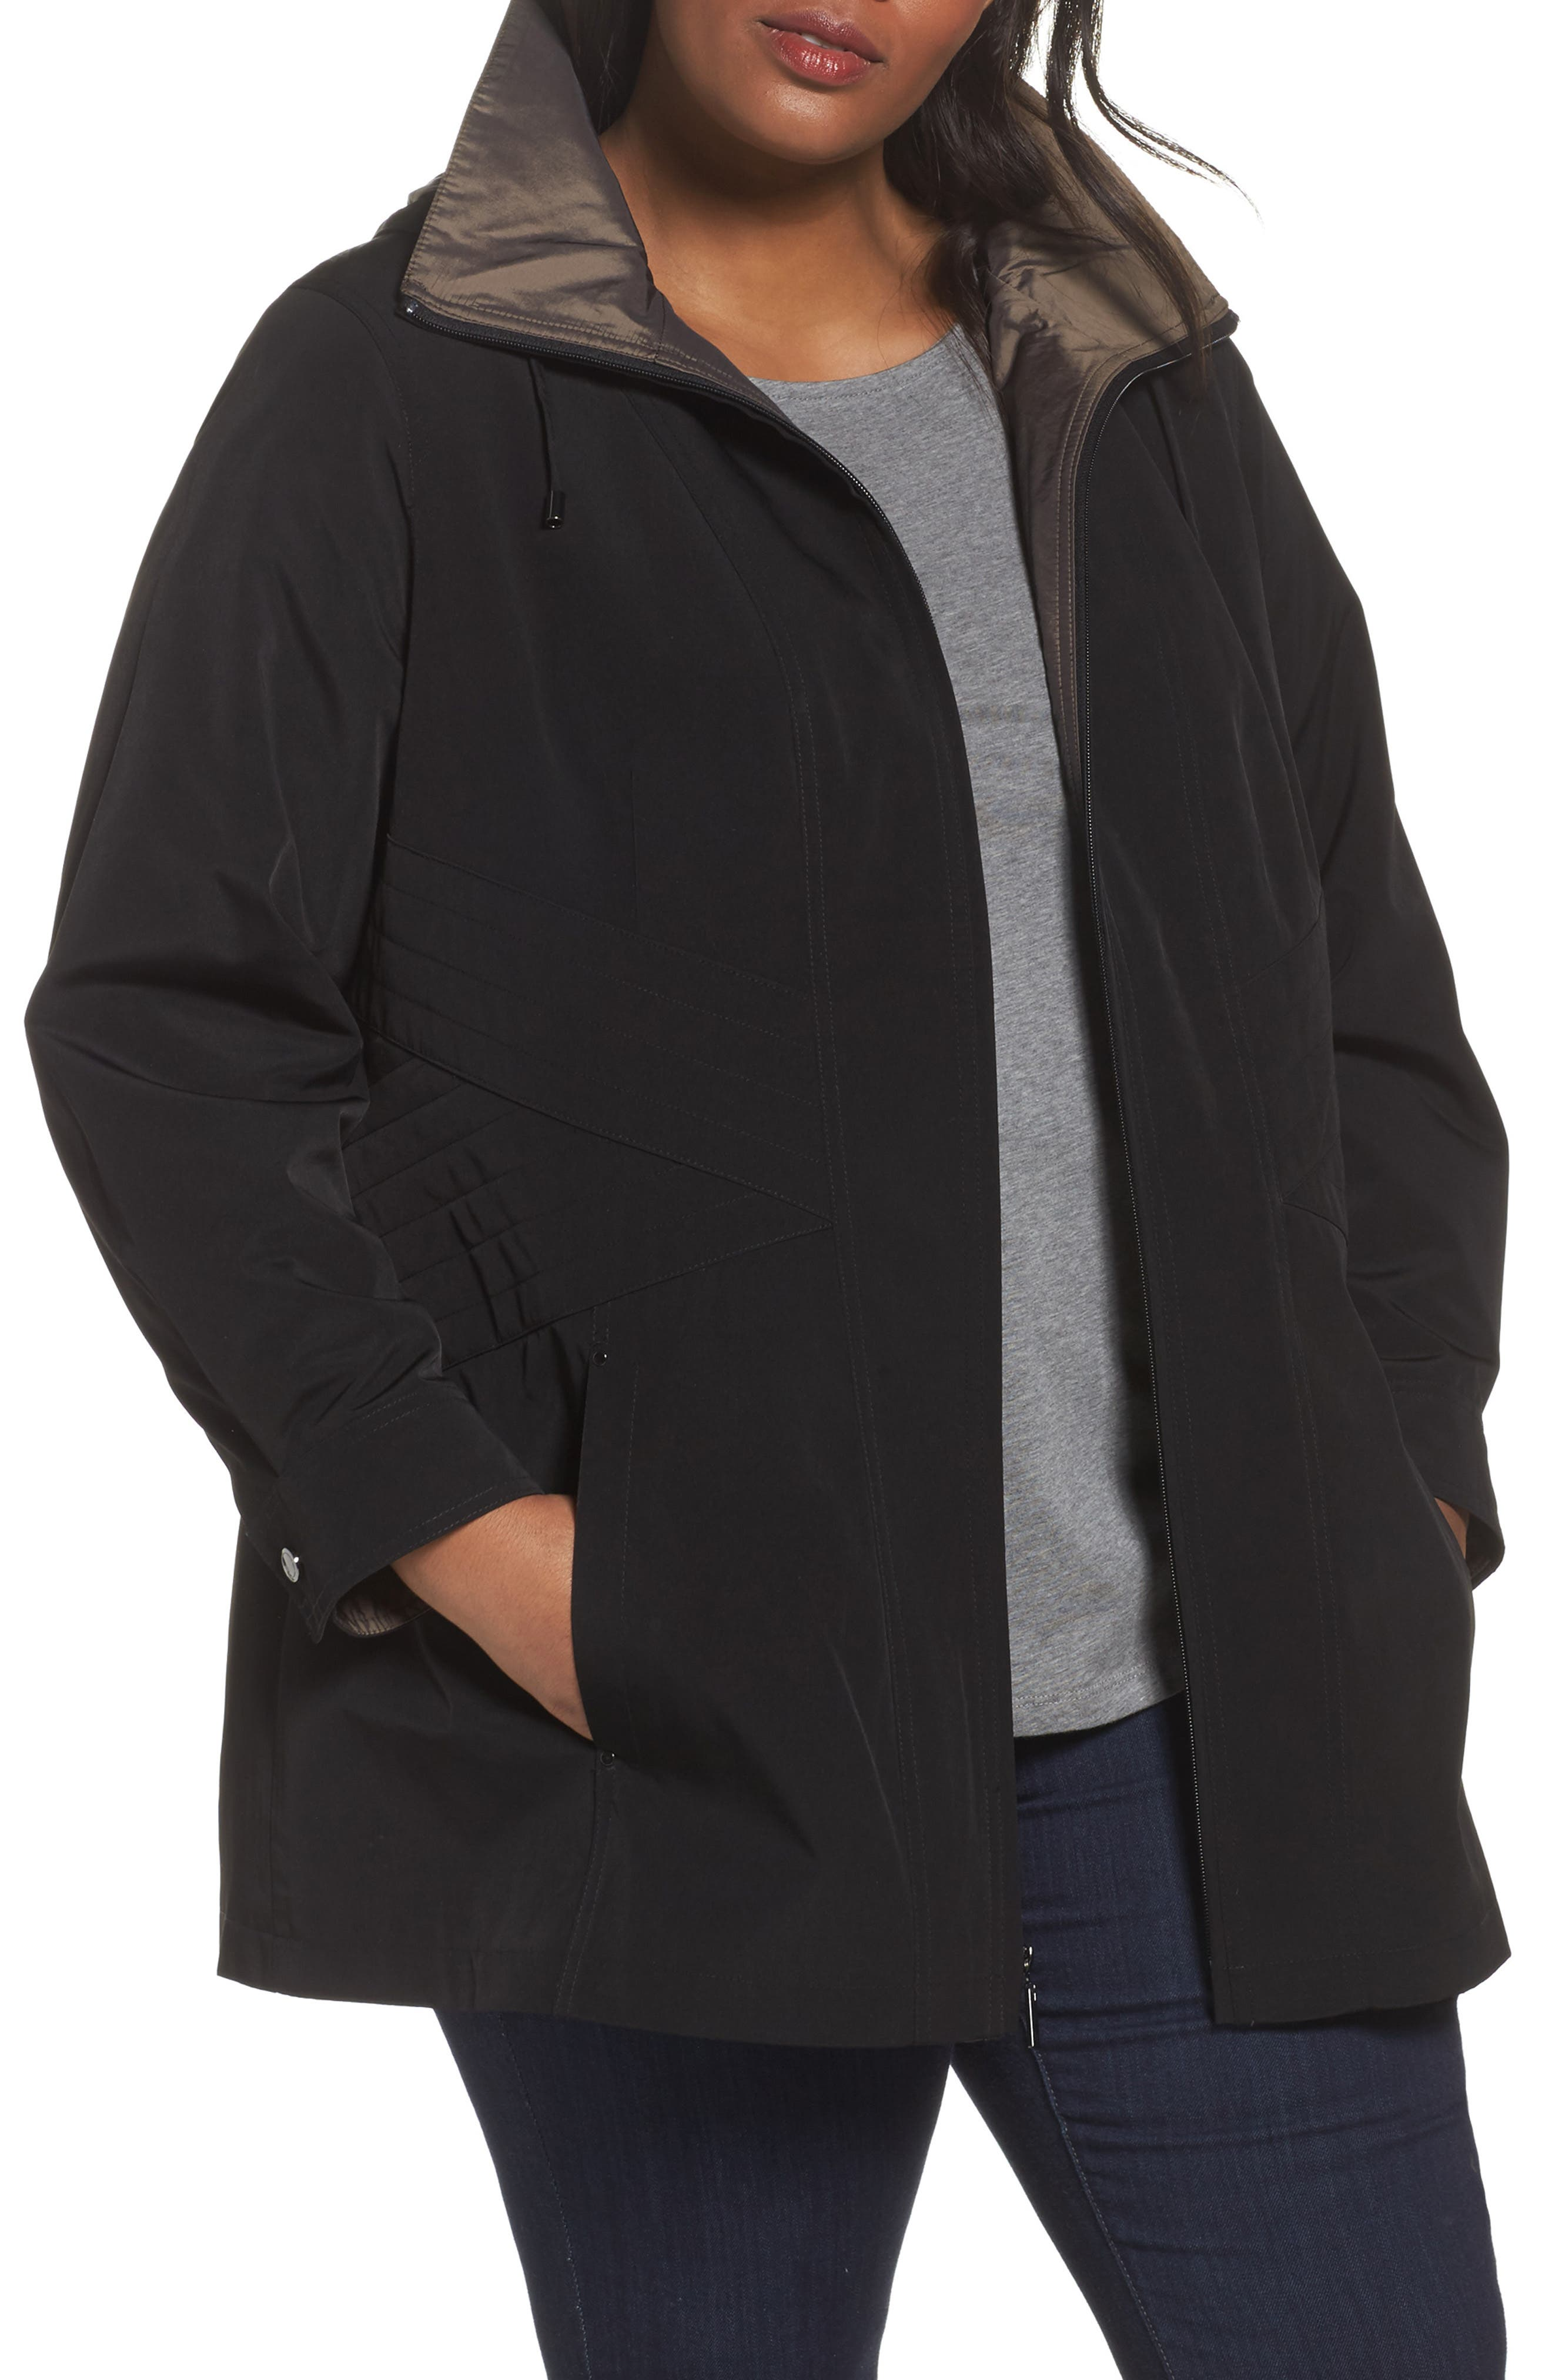 Main Image - Gallery Two-Tone Long Silk Look Raincoat (Plus Size)